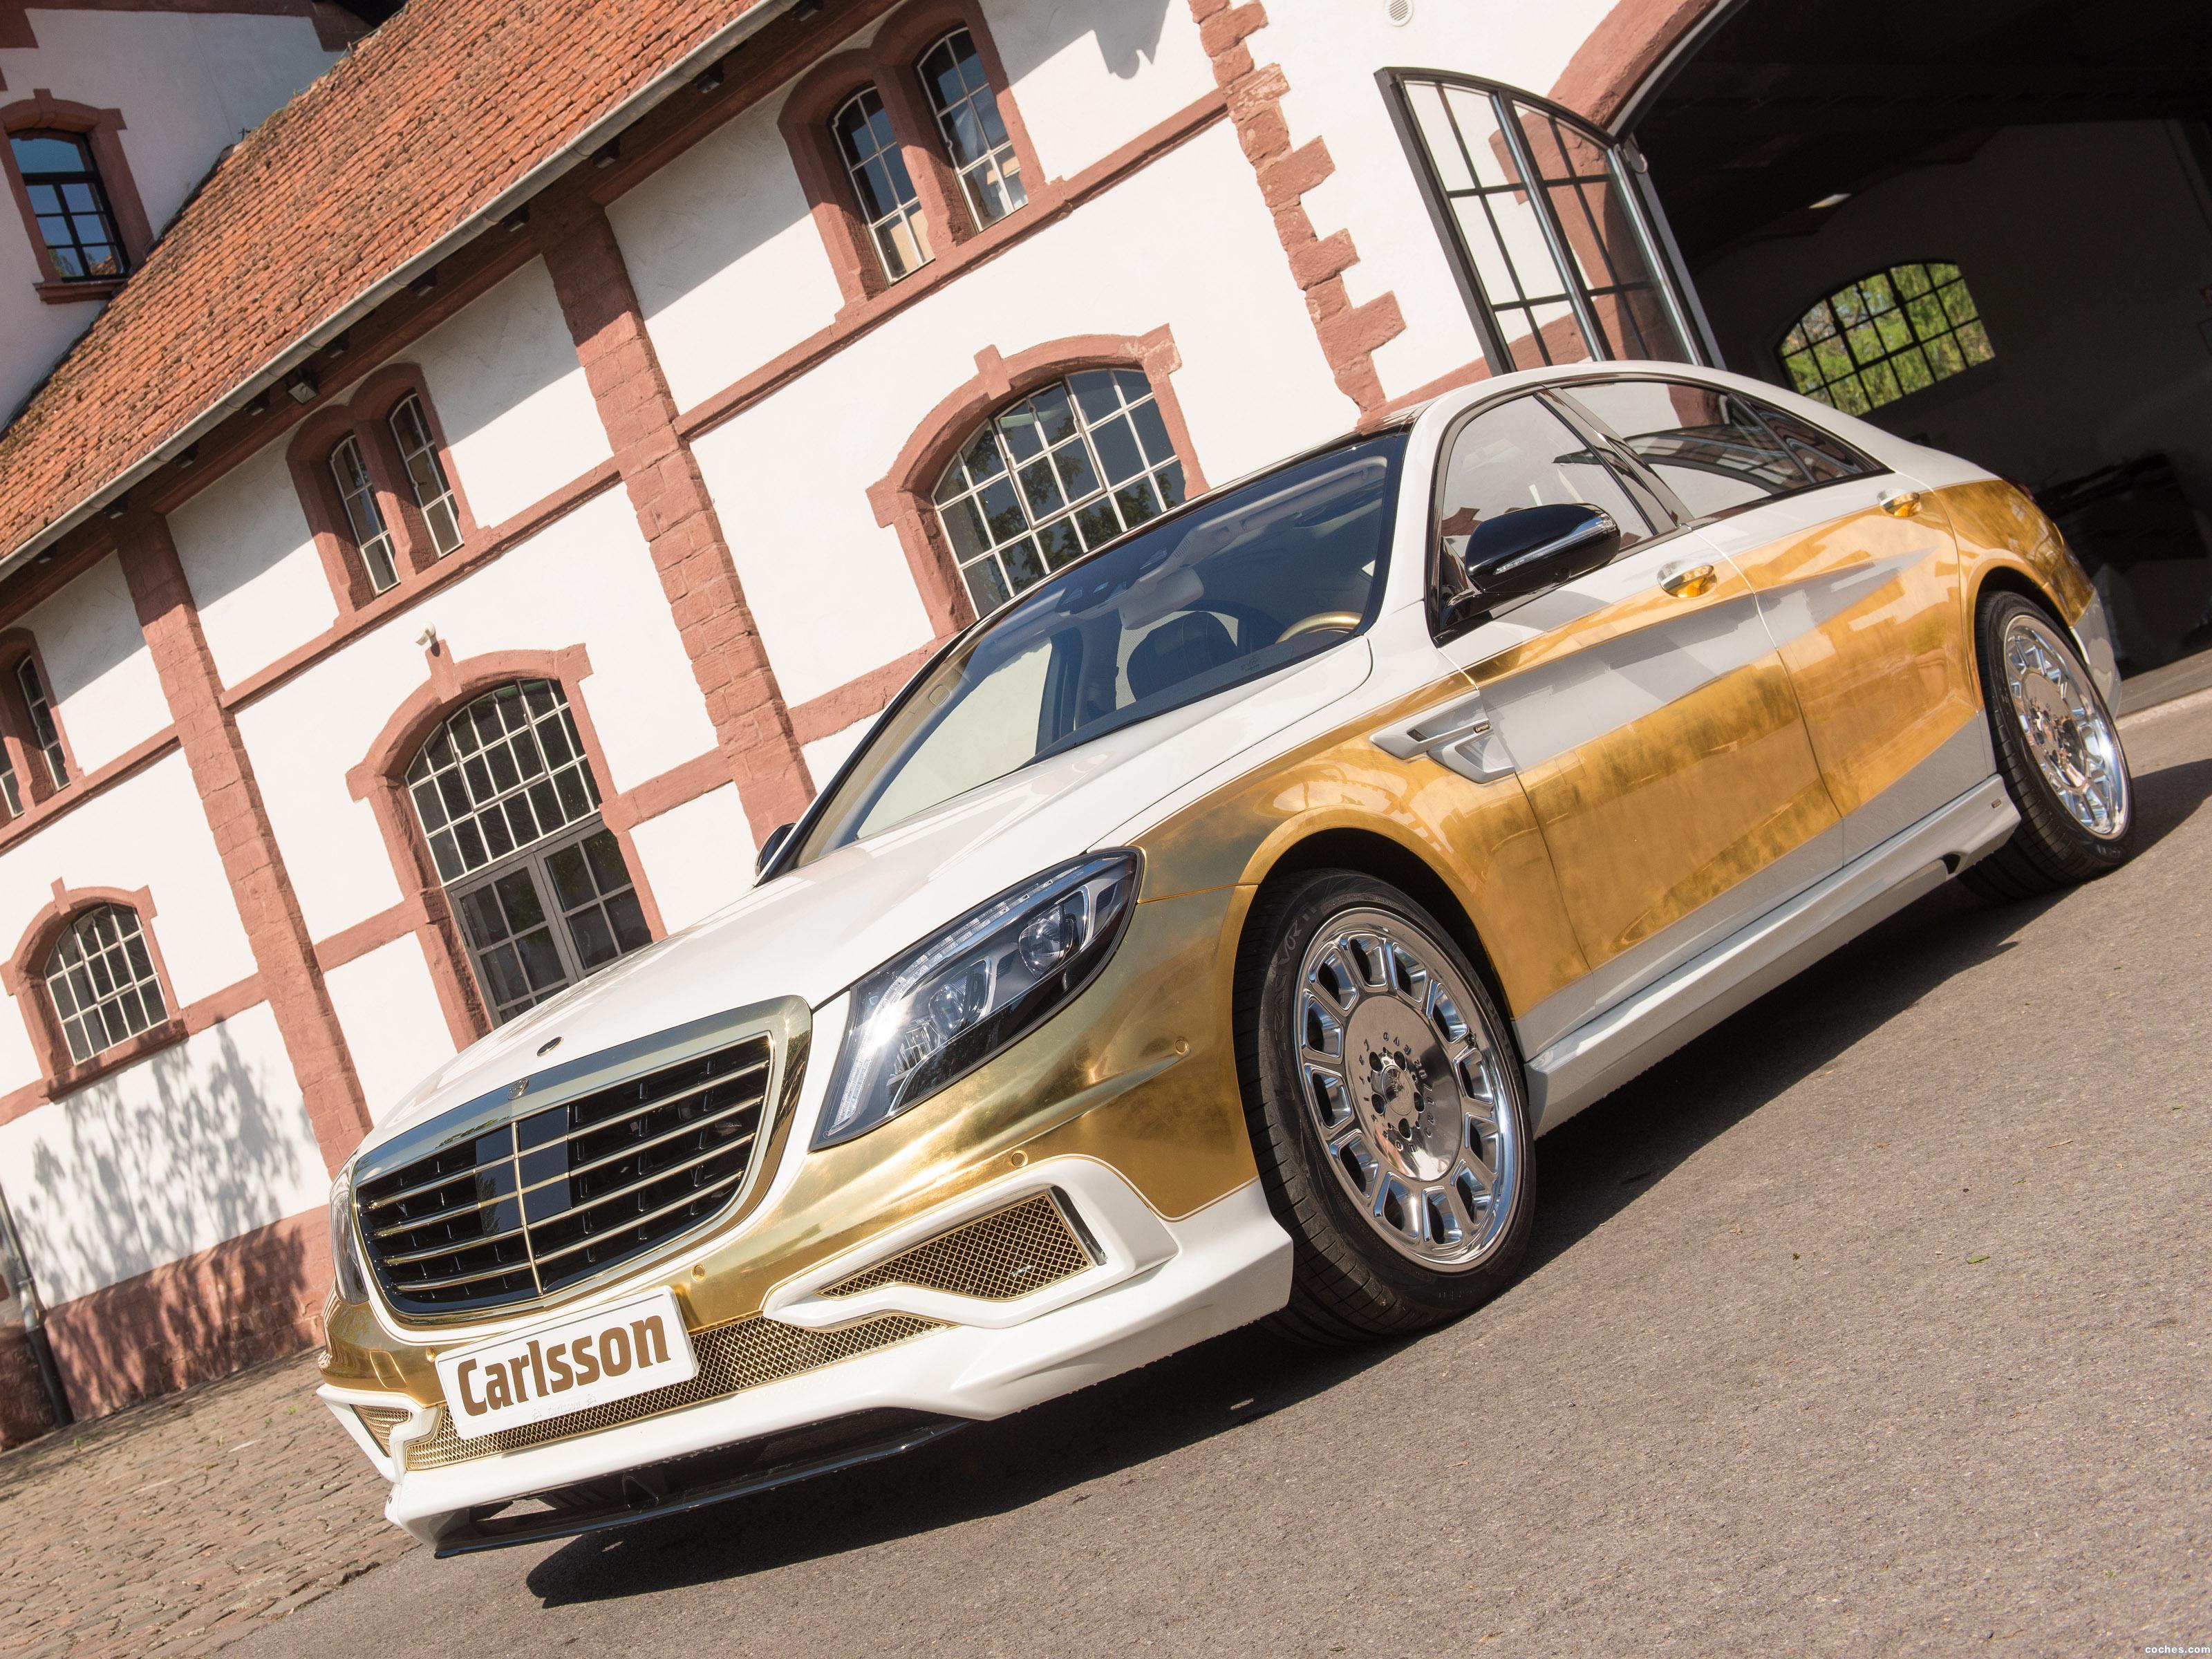 Foto 0 de Carlsson Mercedes Clase S CS50 Versailles W222 2014